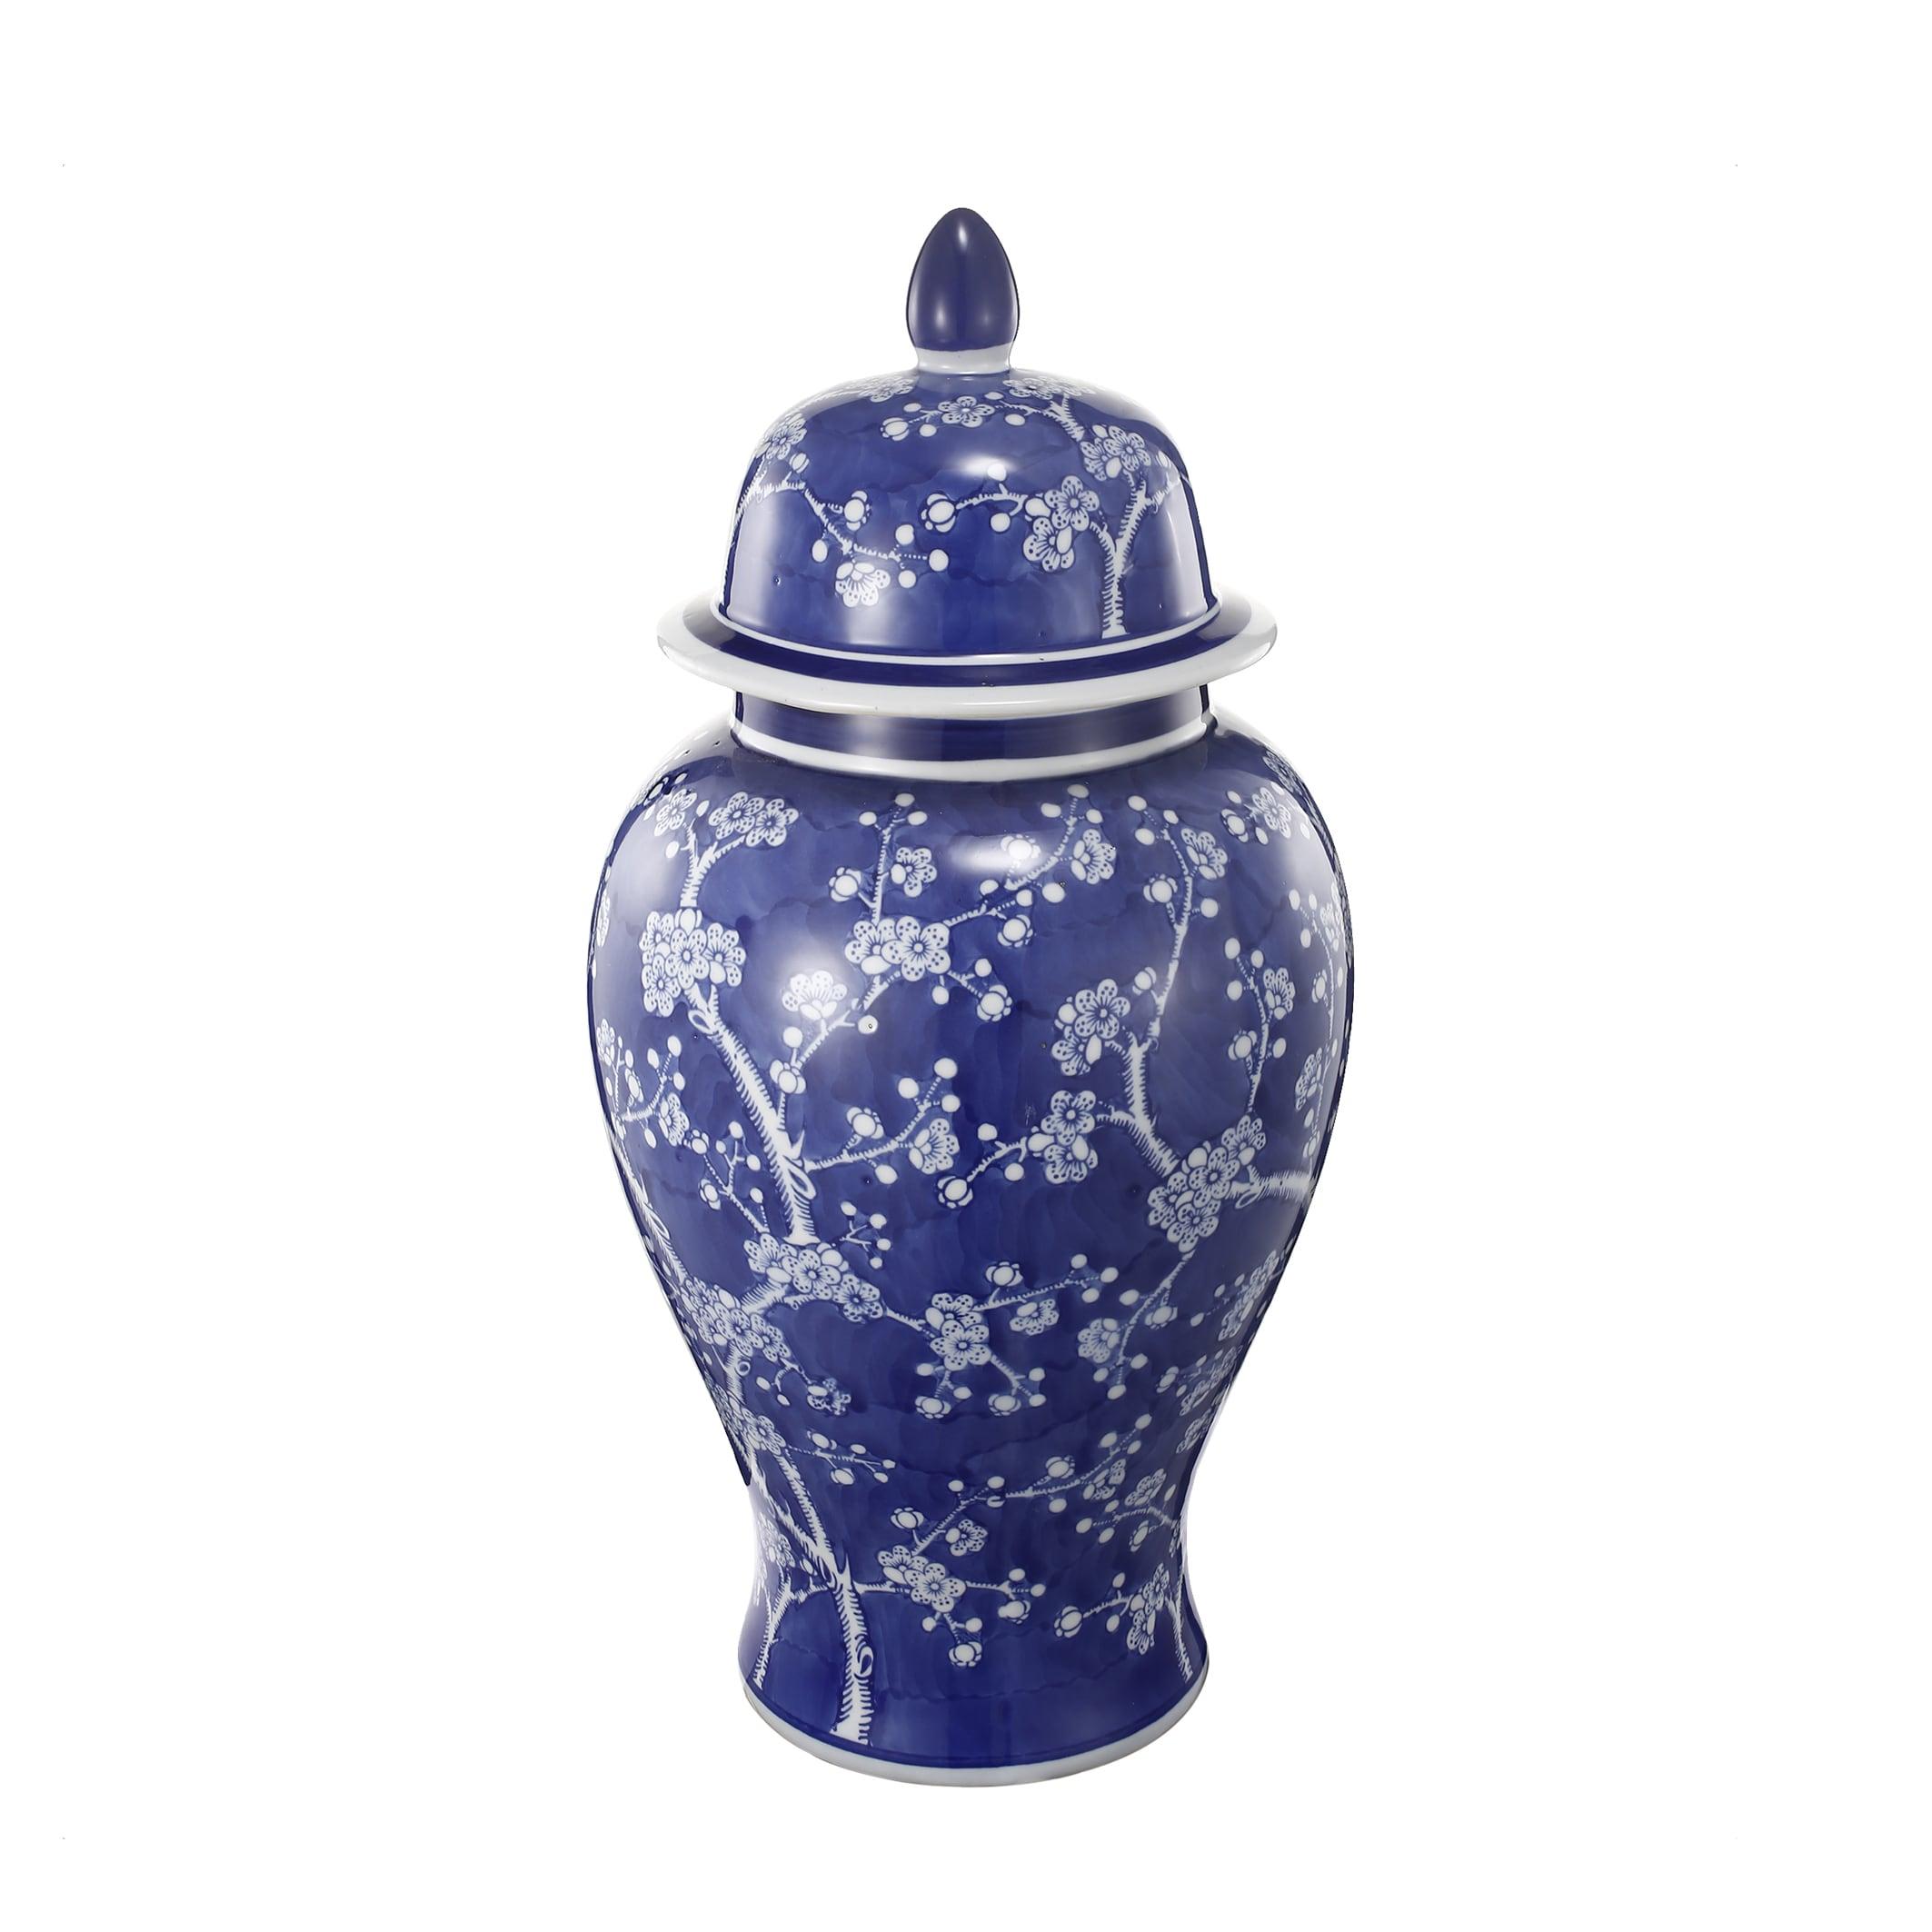 Indigo/White Ceramic 9.5-inch x 18-inch Ginger Jar (Ginge...